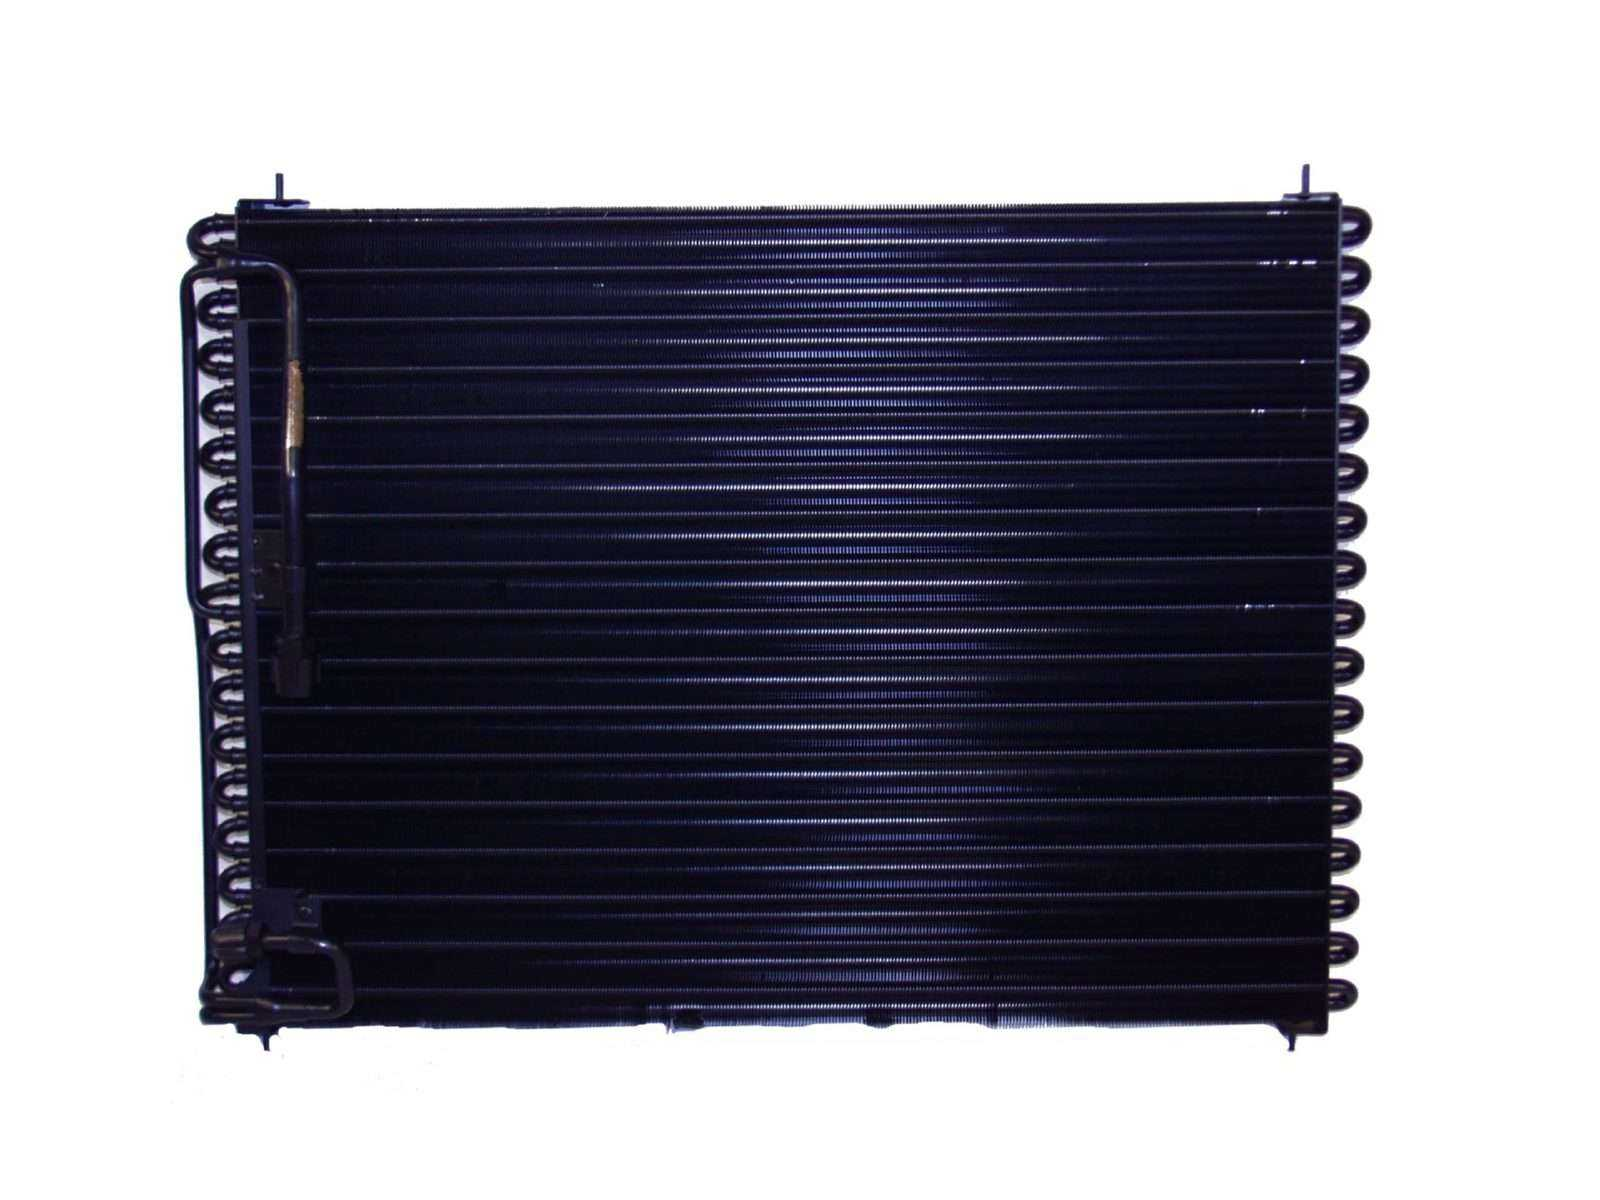 condenseur radiateur de climatisation volvo 740 760 940 et. Black Bedroom Furniture Sets. Home Design Ideas